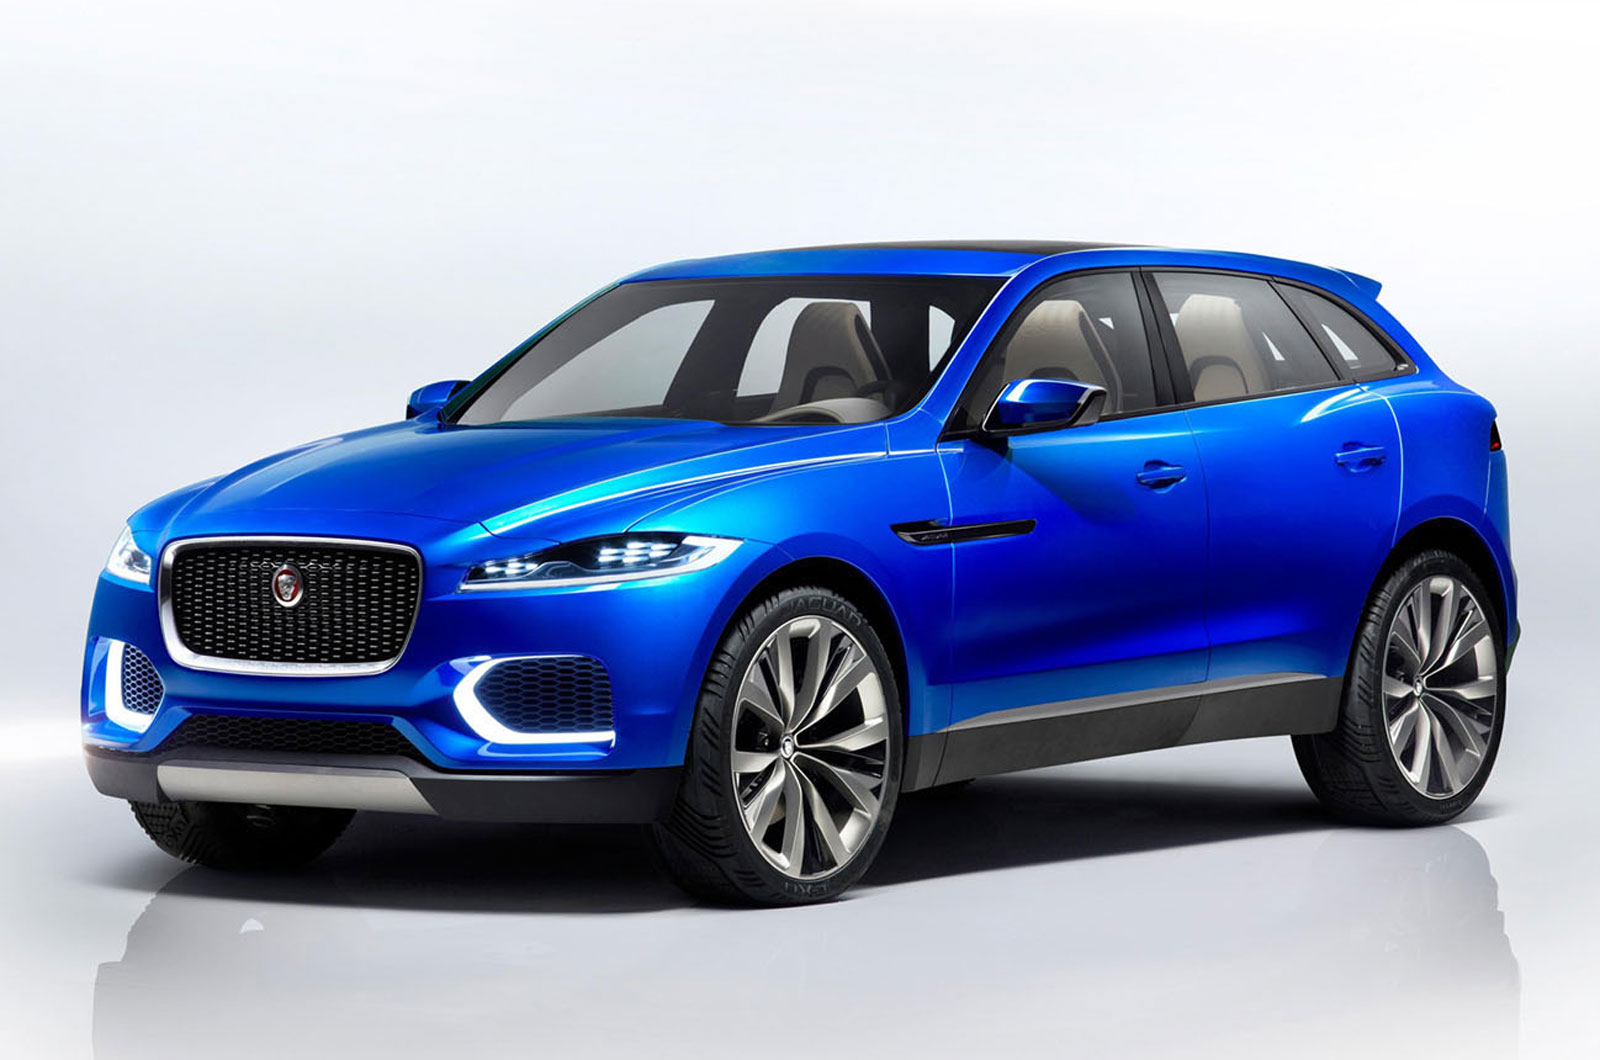 jaguar 39 s new 2016 suv 39 is not an suv 39 autocar. Black Bedroom Furniture Sets. Home Design Ideas